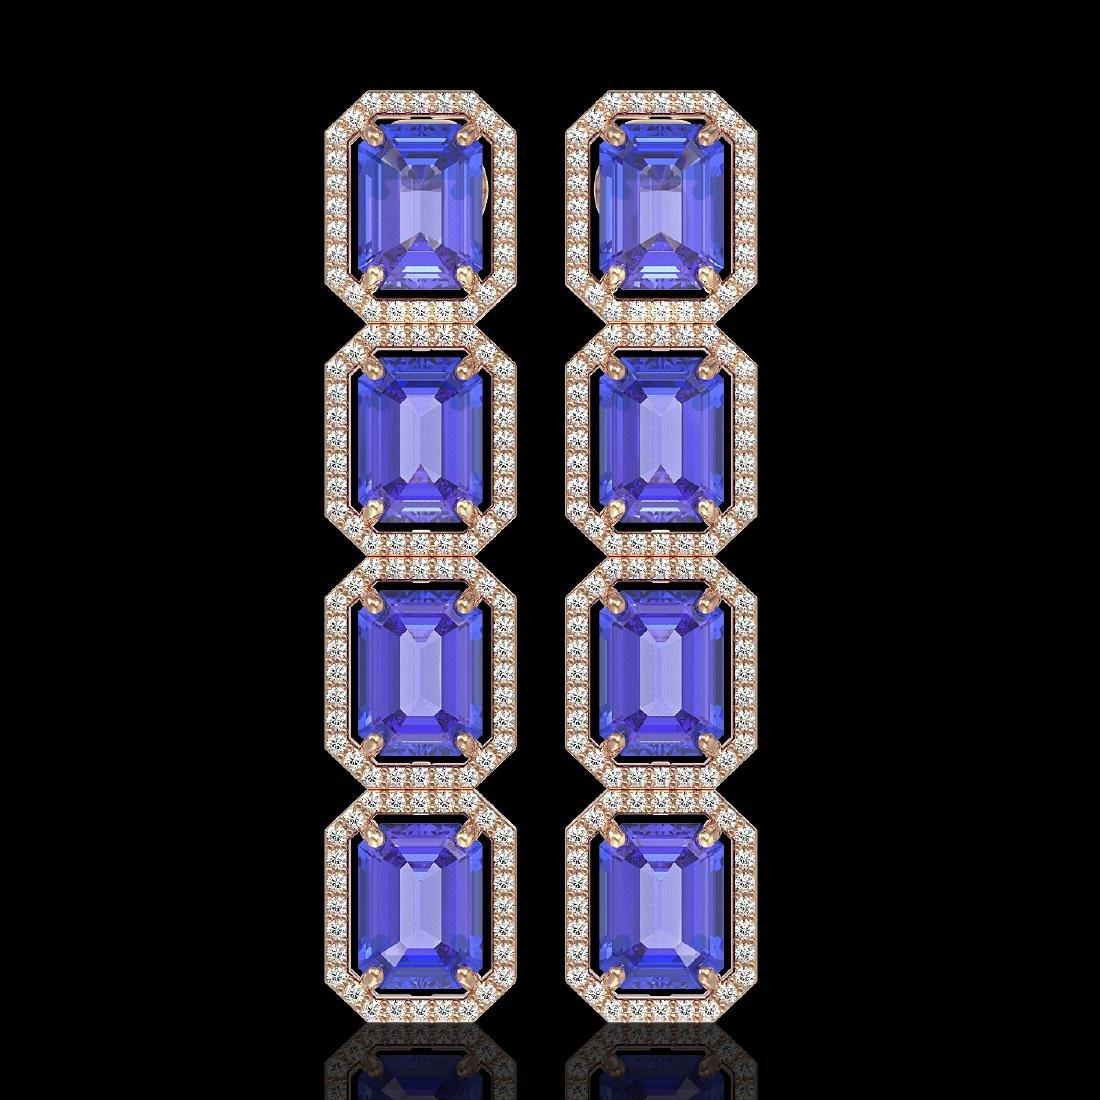 19.39 CTW Tanzanite & Diamond Halo Earrings 10K Rose